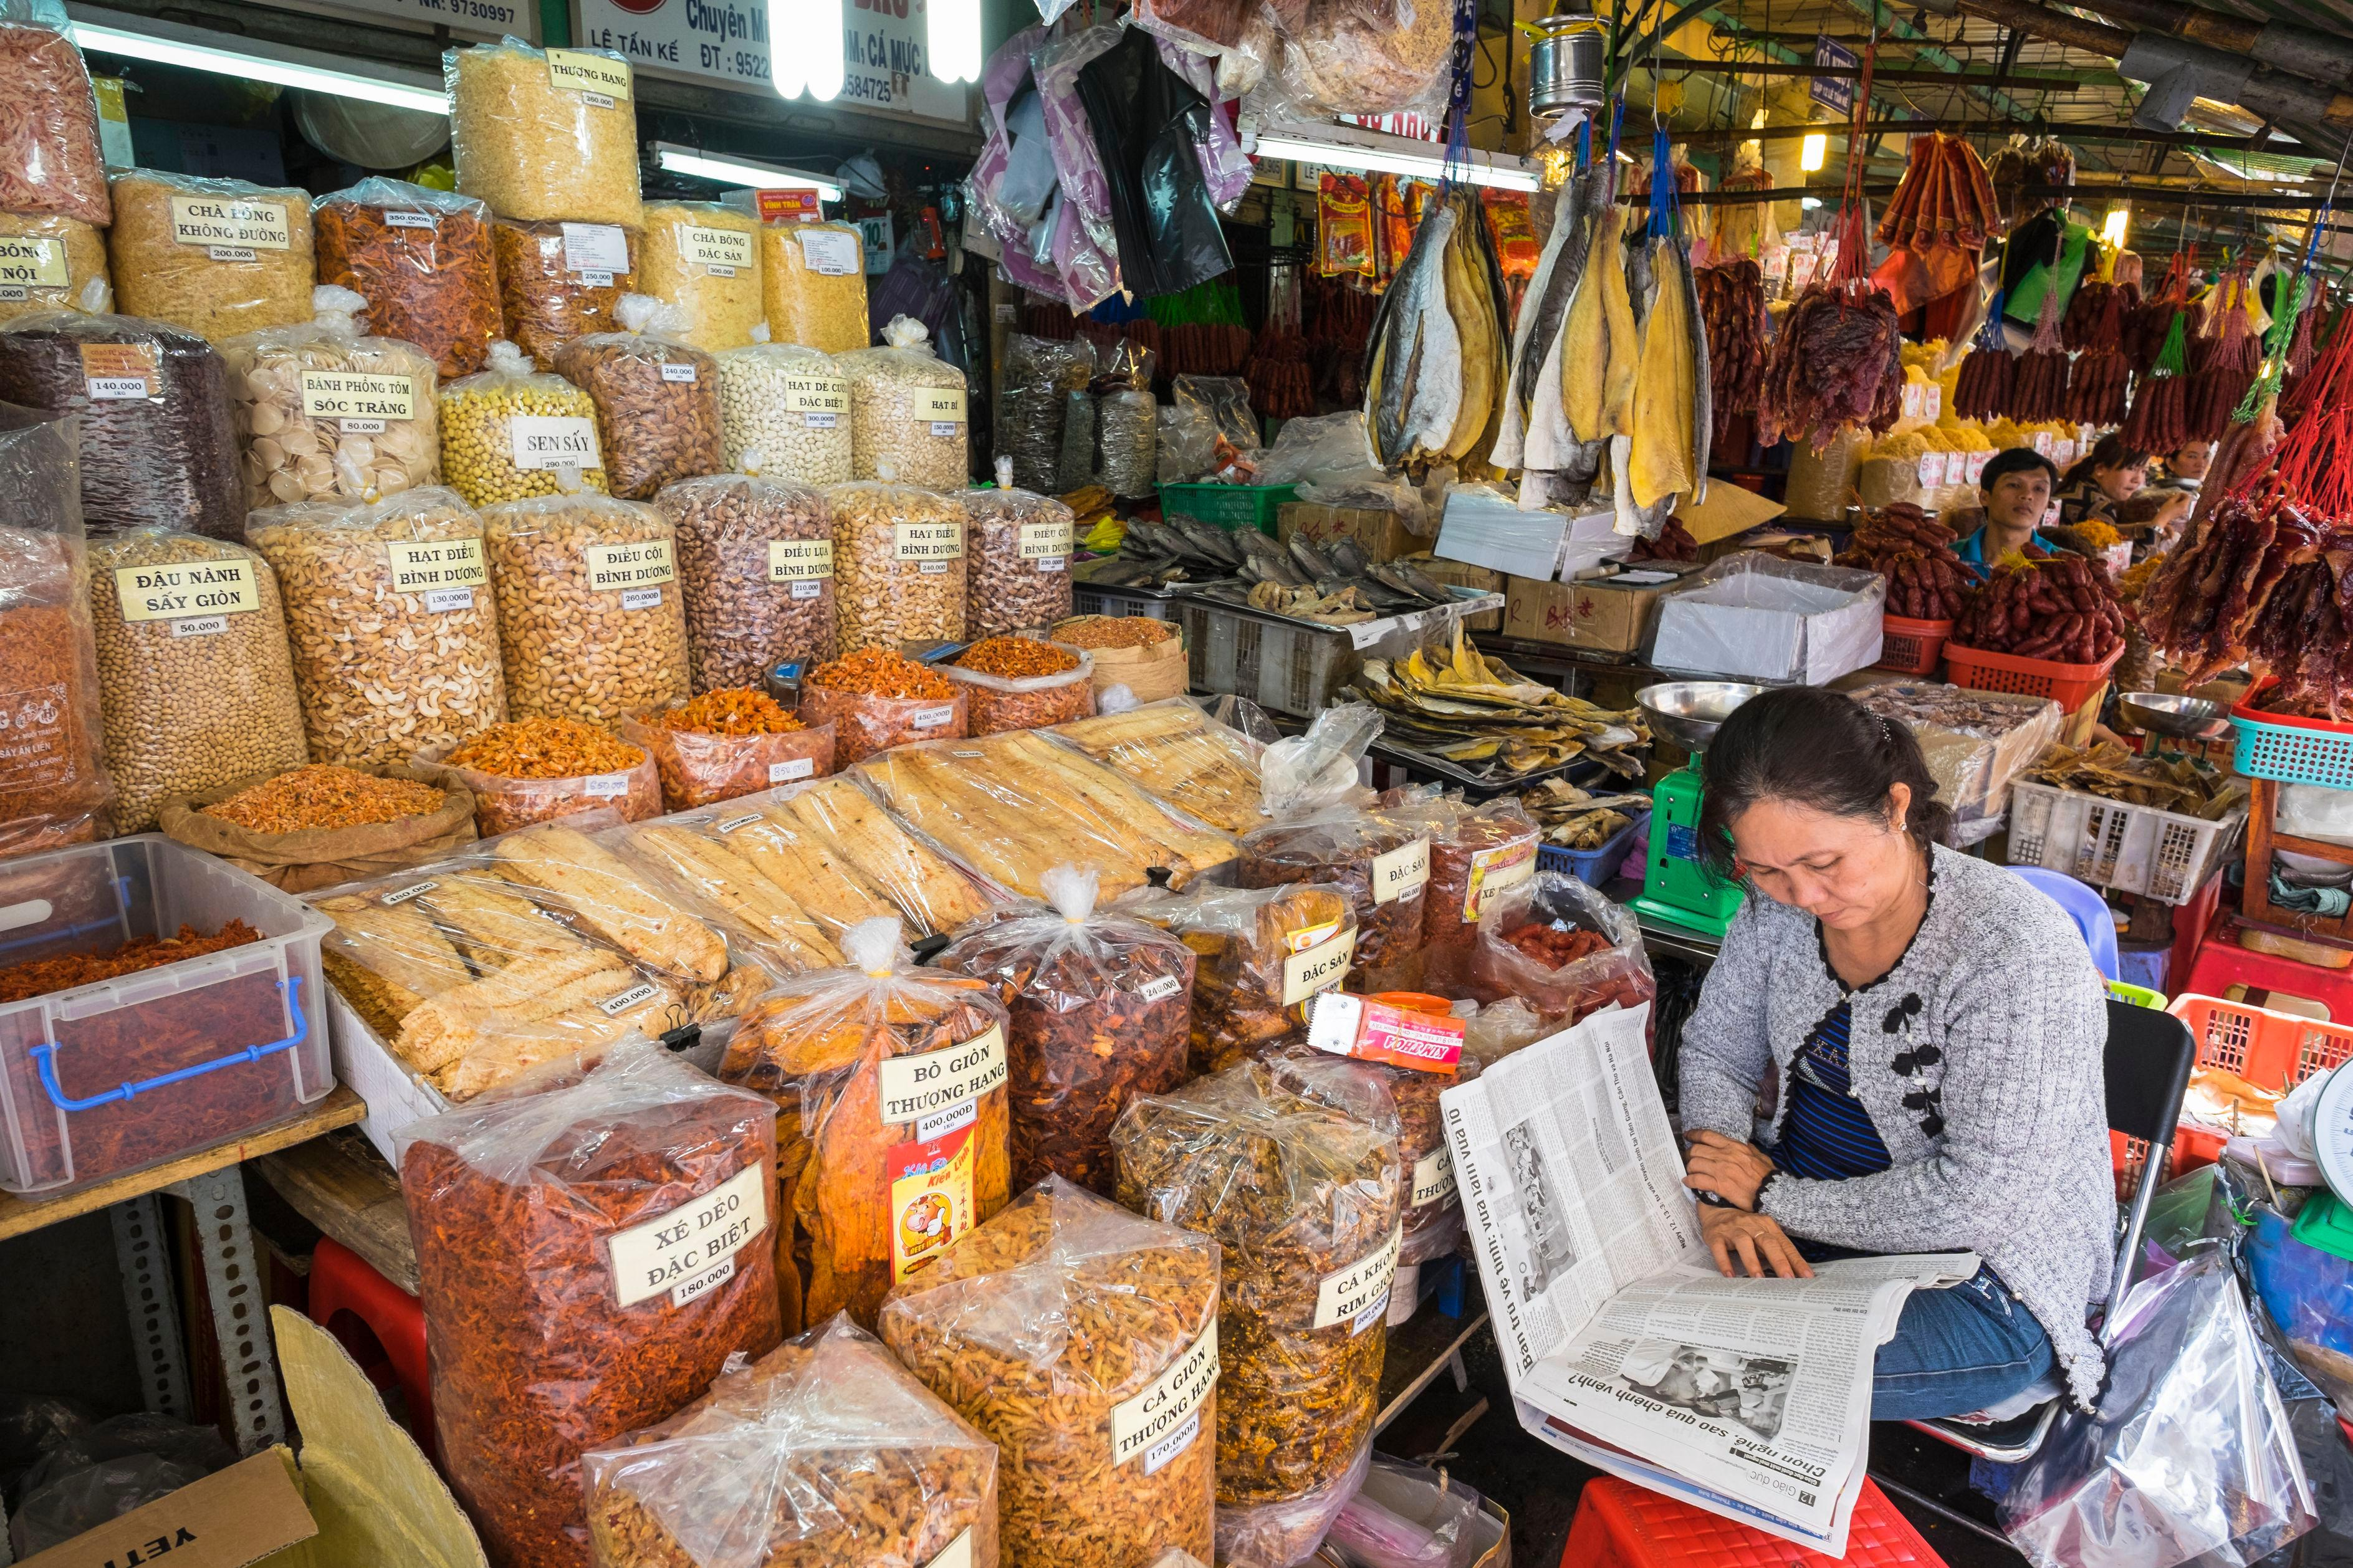 Vietnam, Southeast region, Ho Chi Minh City (Saigon), Cholon district, Binh Tay market